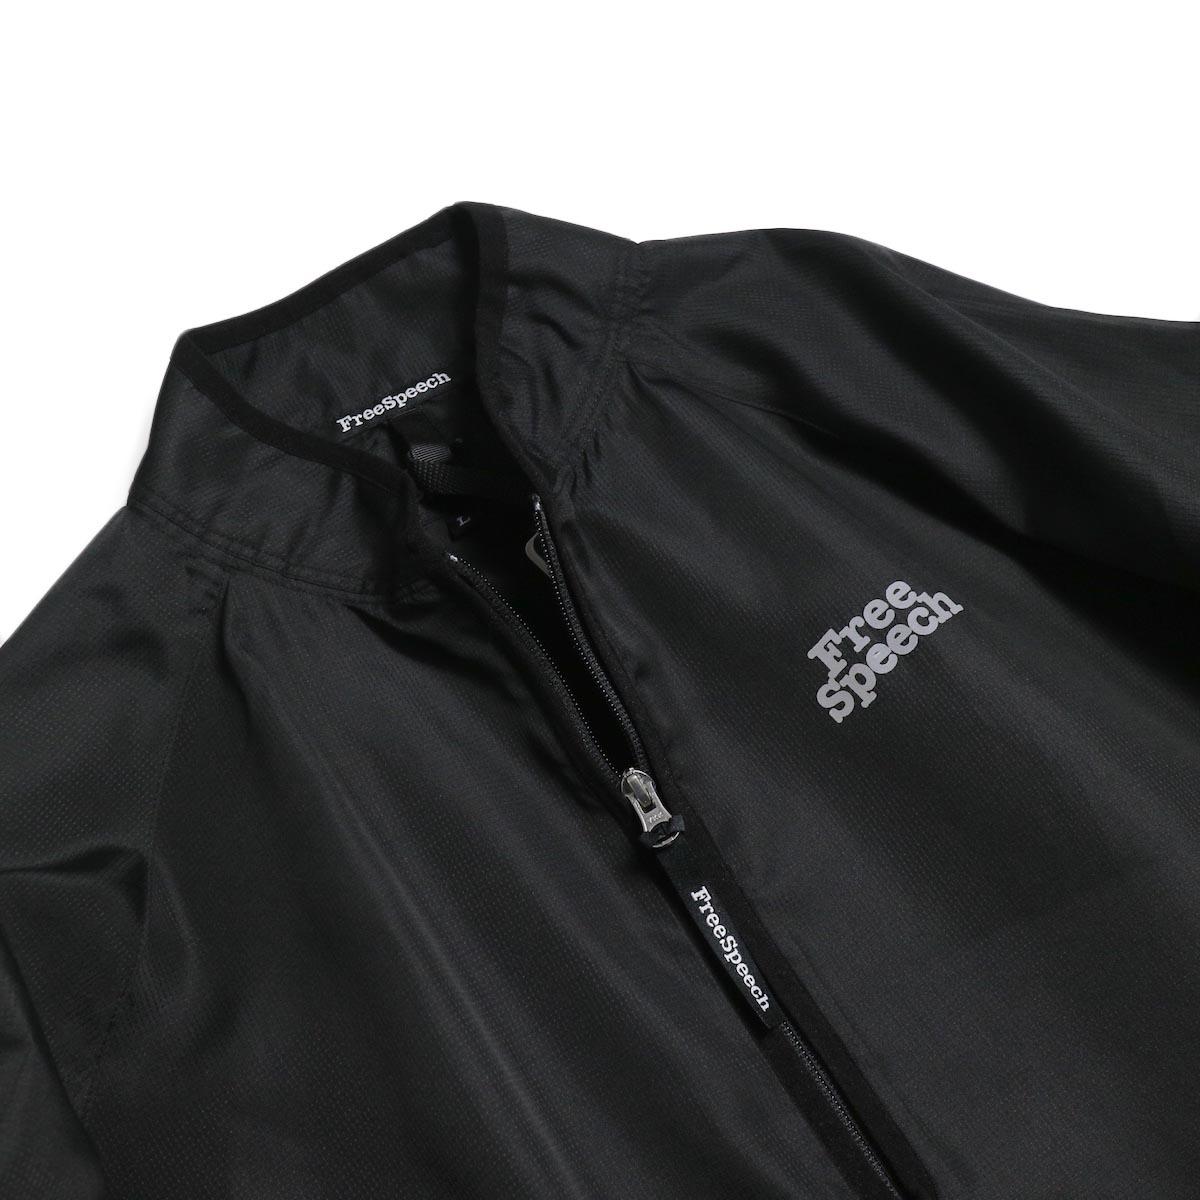 Free Speech / Half Zip Pullover Blouson -Black 襟